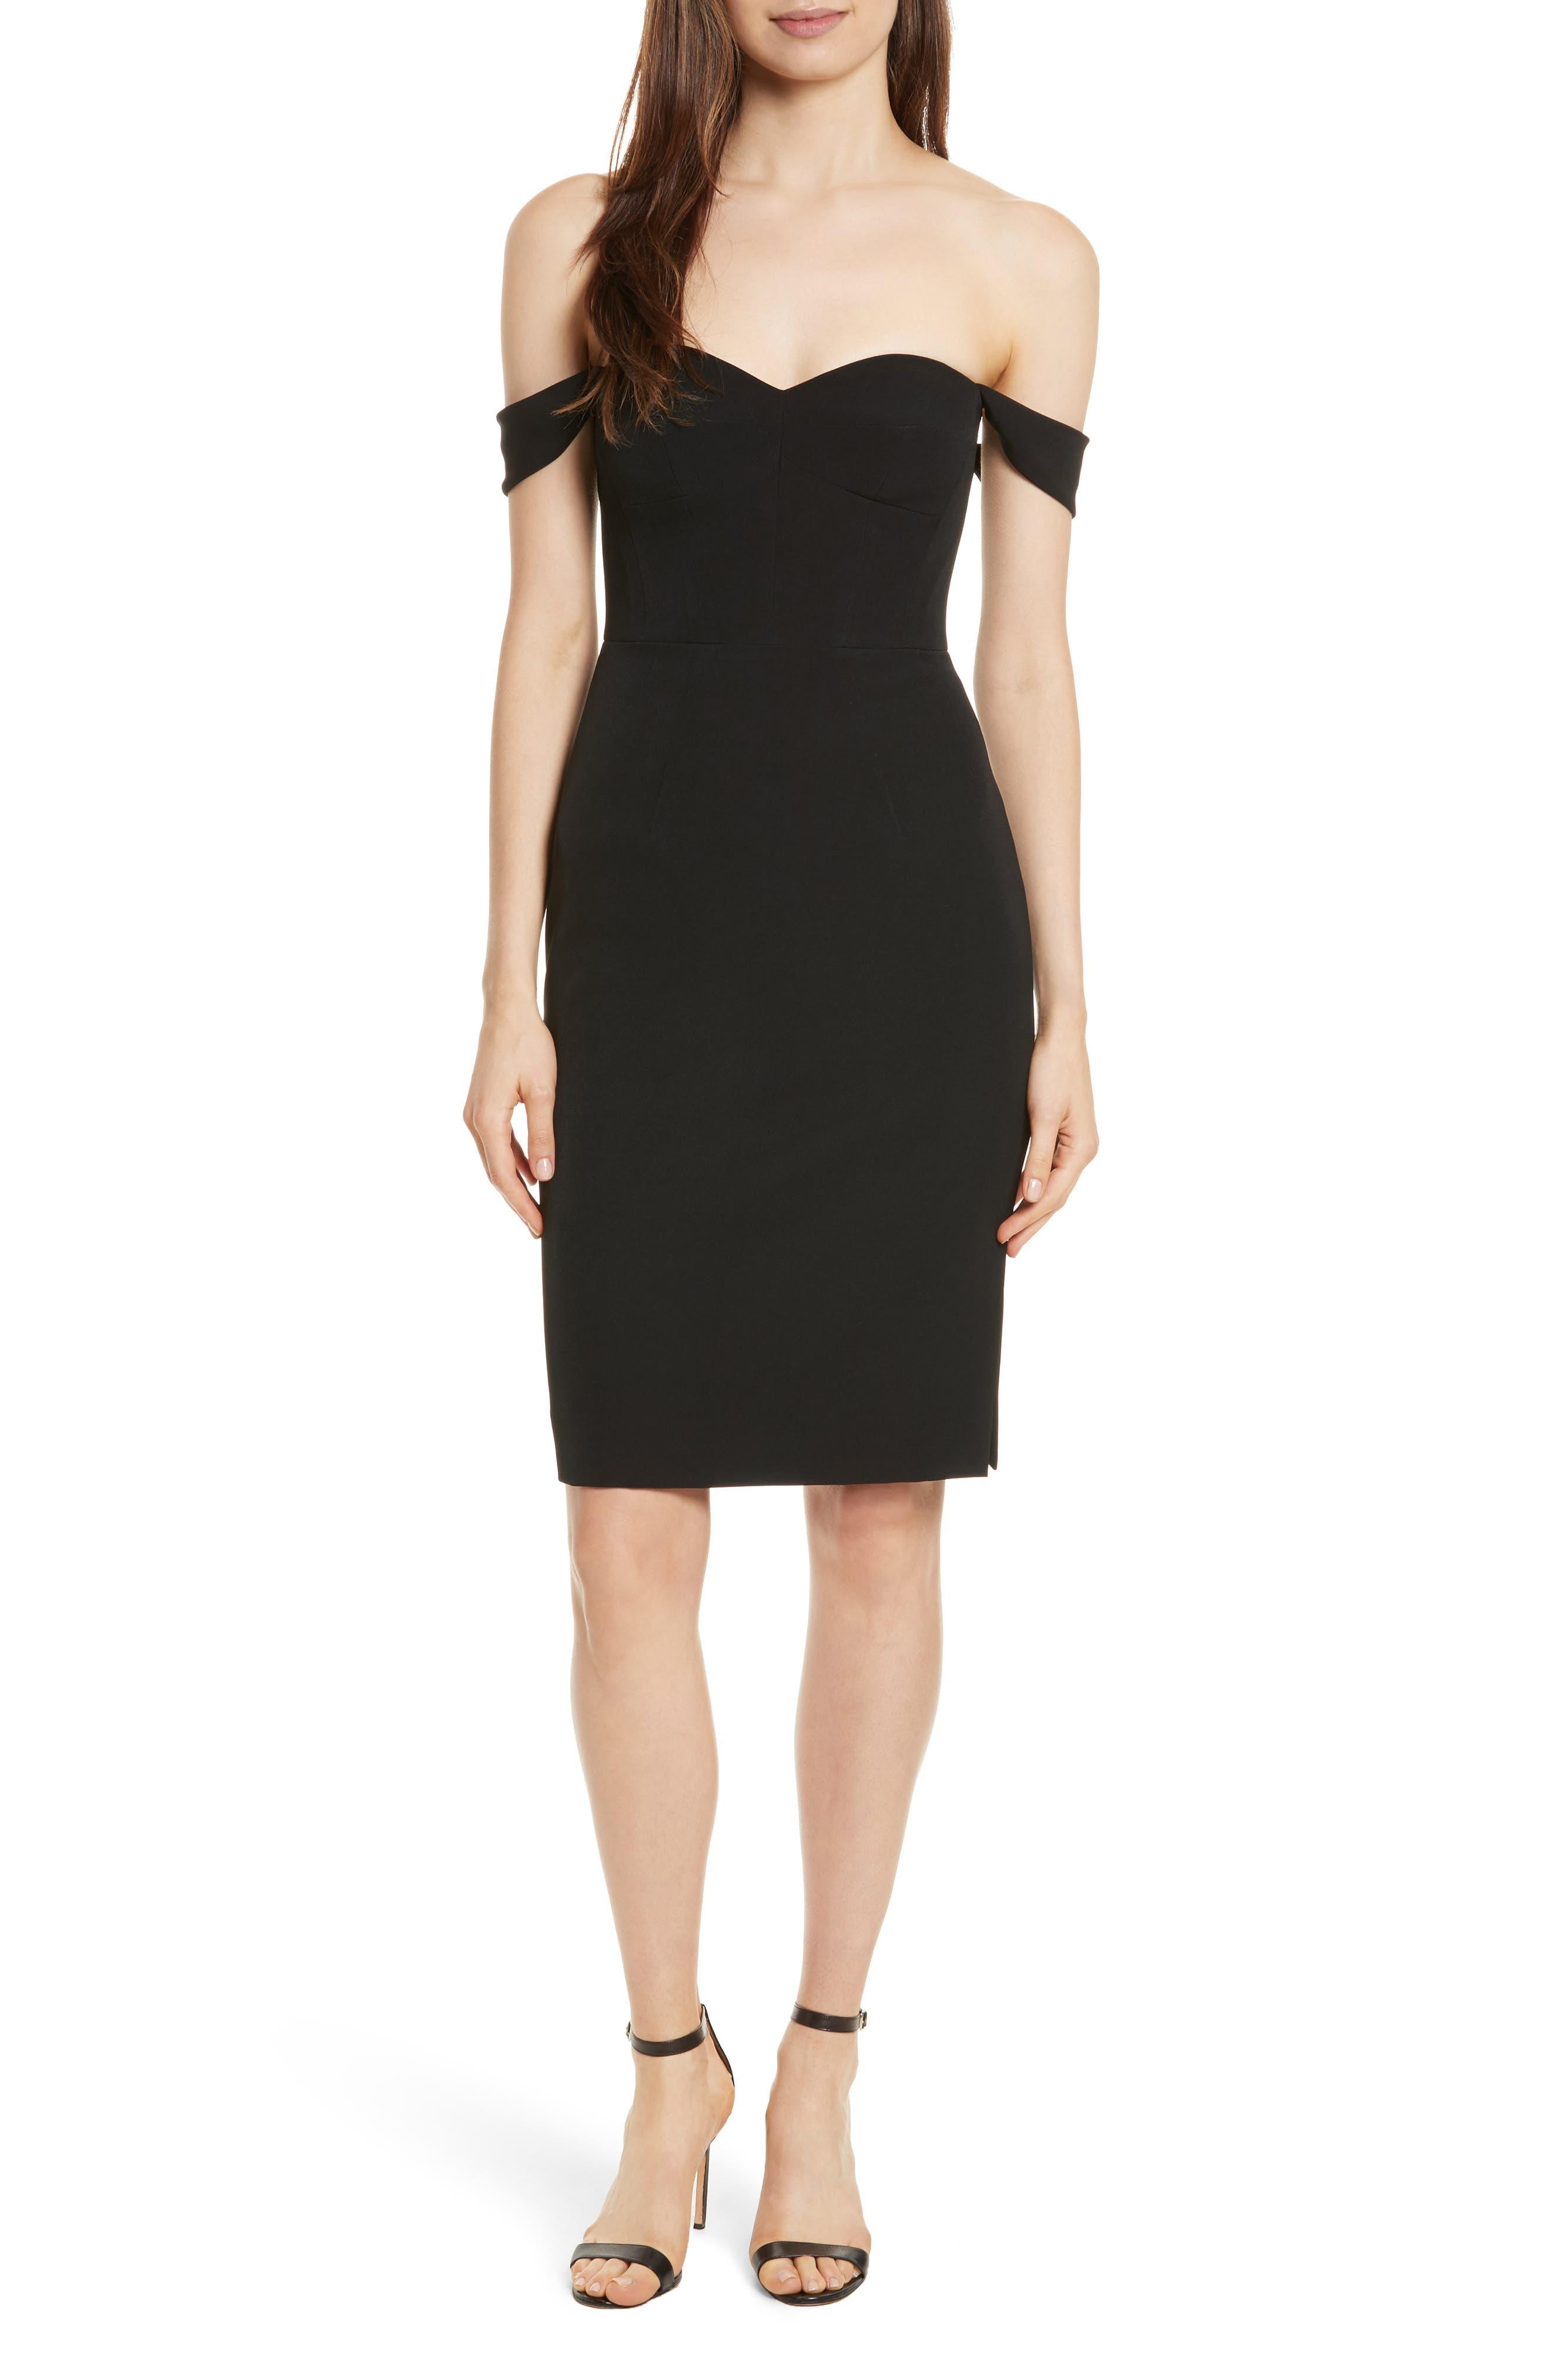 Alternate Image 1 Selected - Milly Karen Italian Cady Off the Shoulder Dress